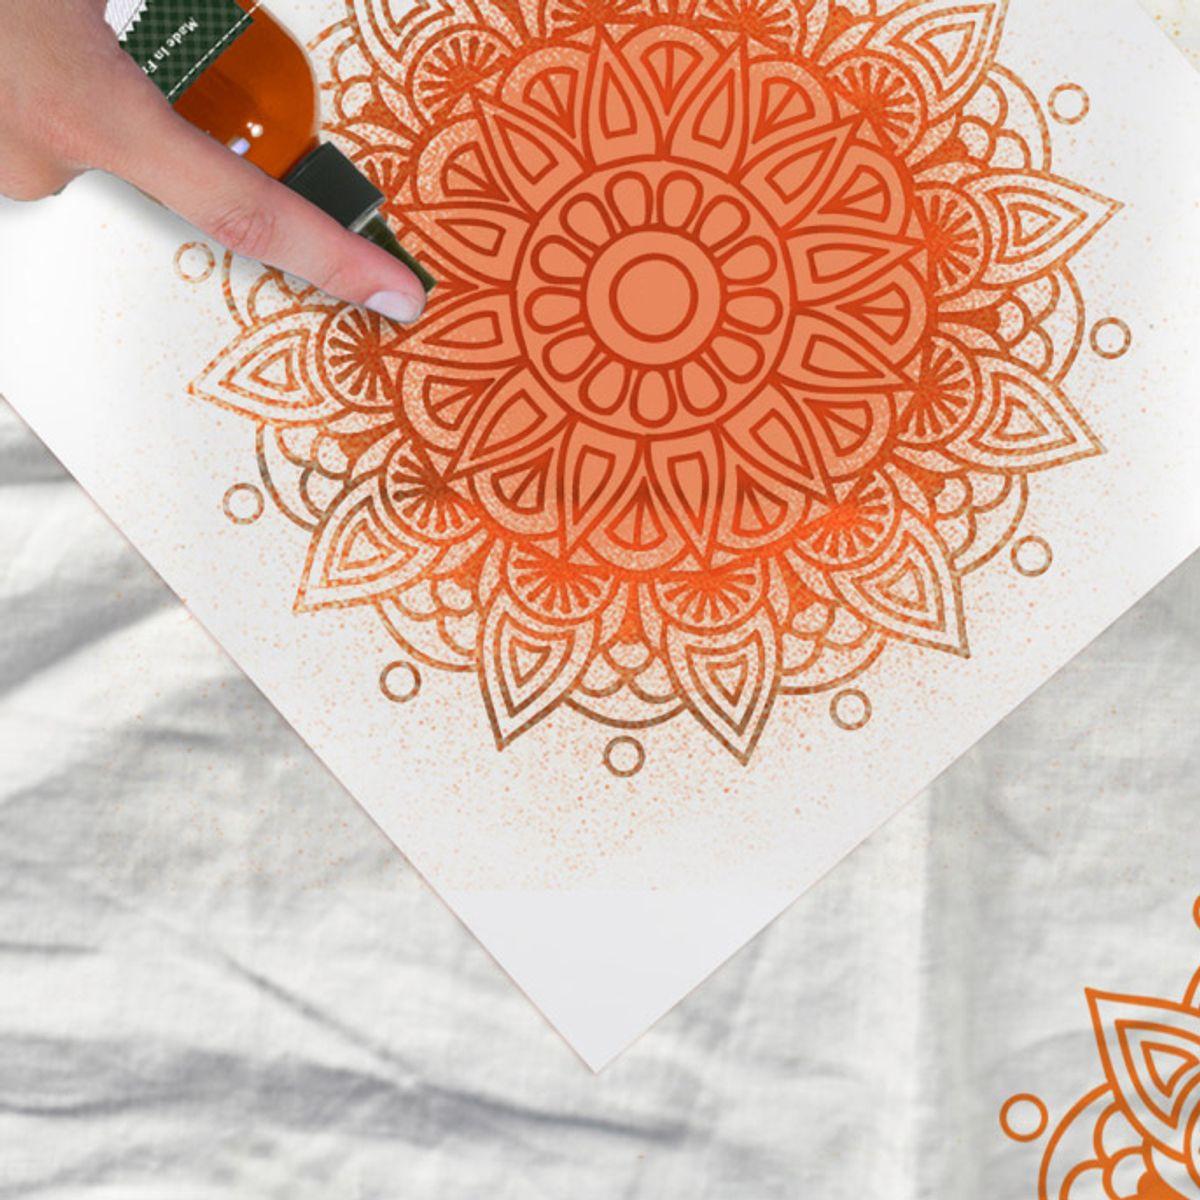 Teinture textile pigment IZINK